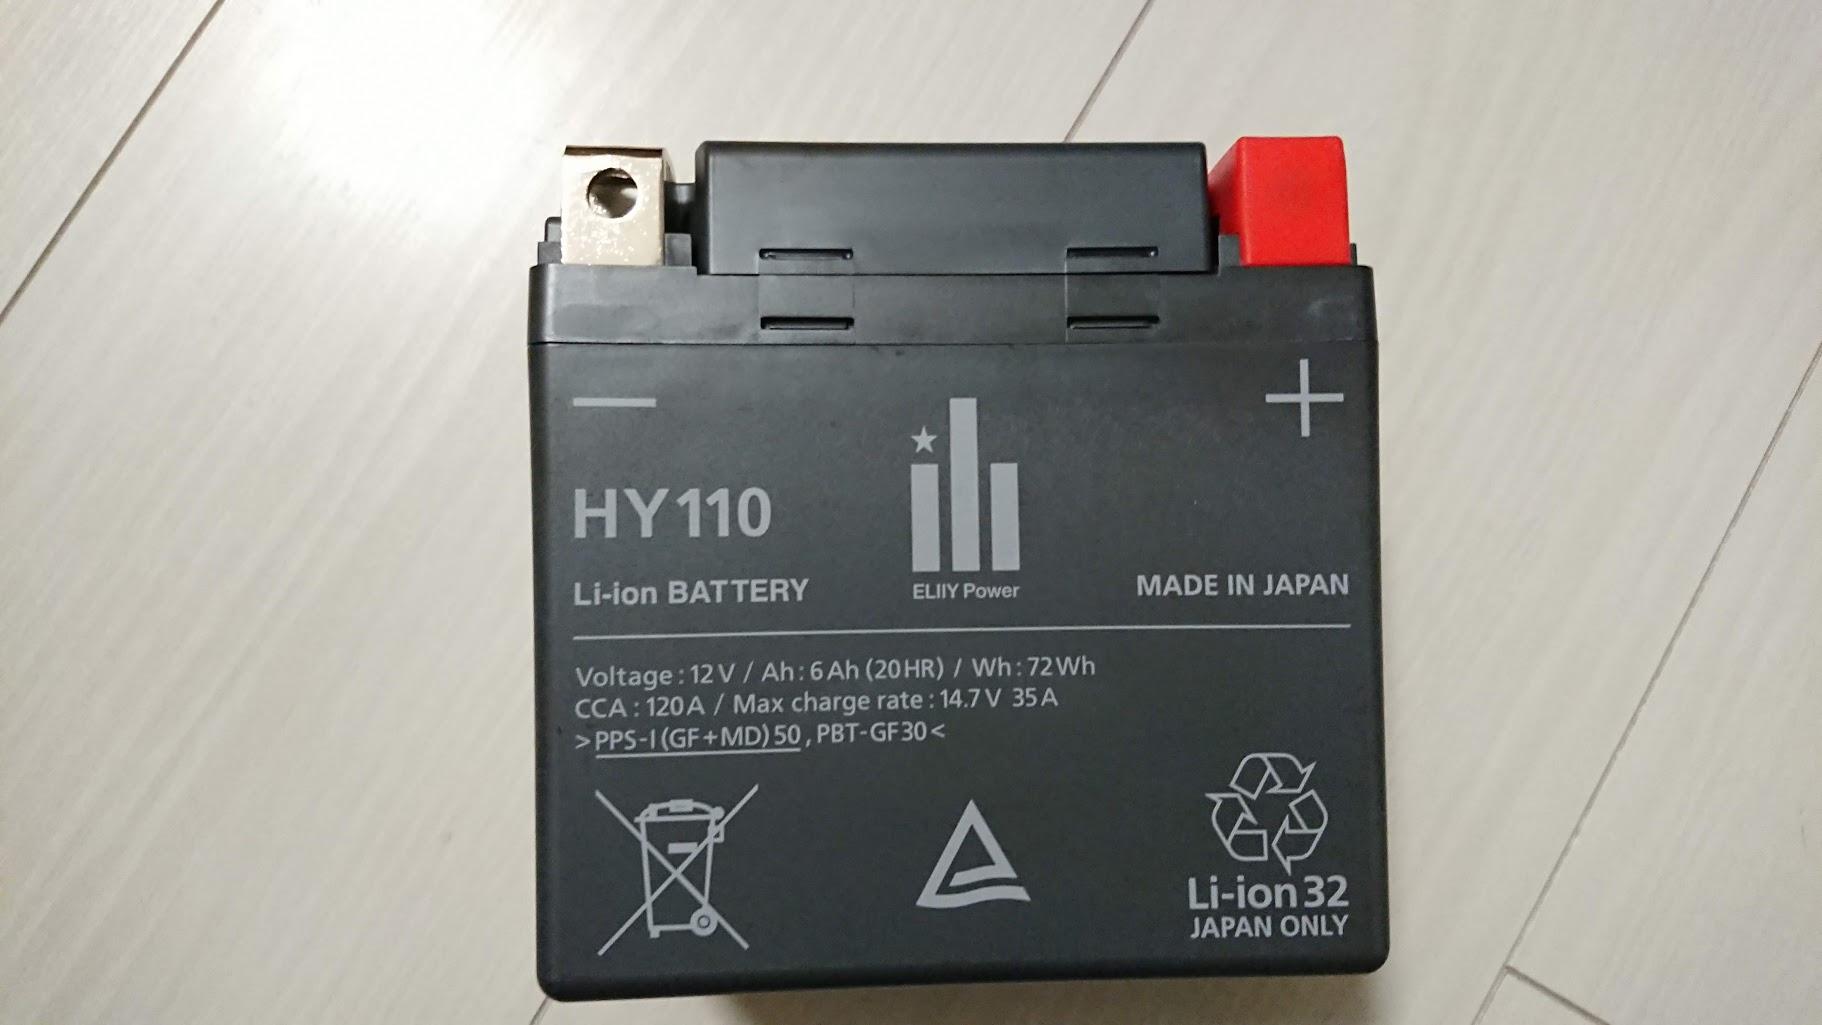 Eliiy Power「HY110」の外観。